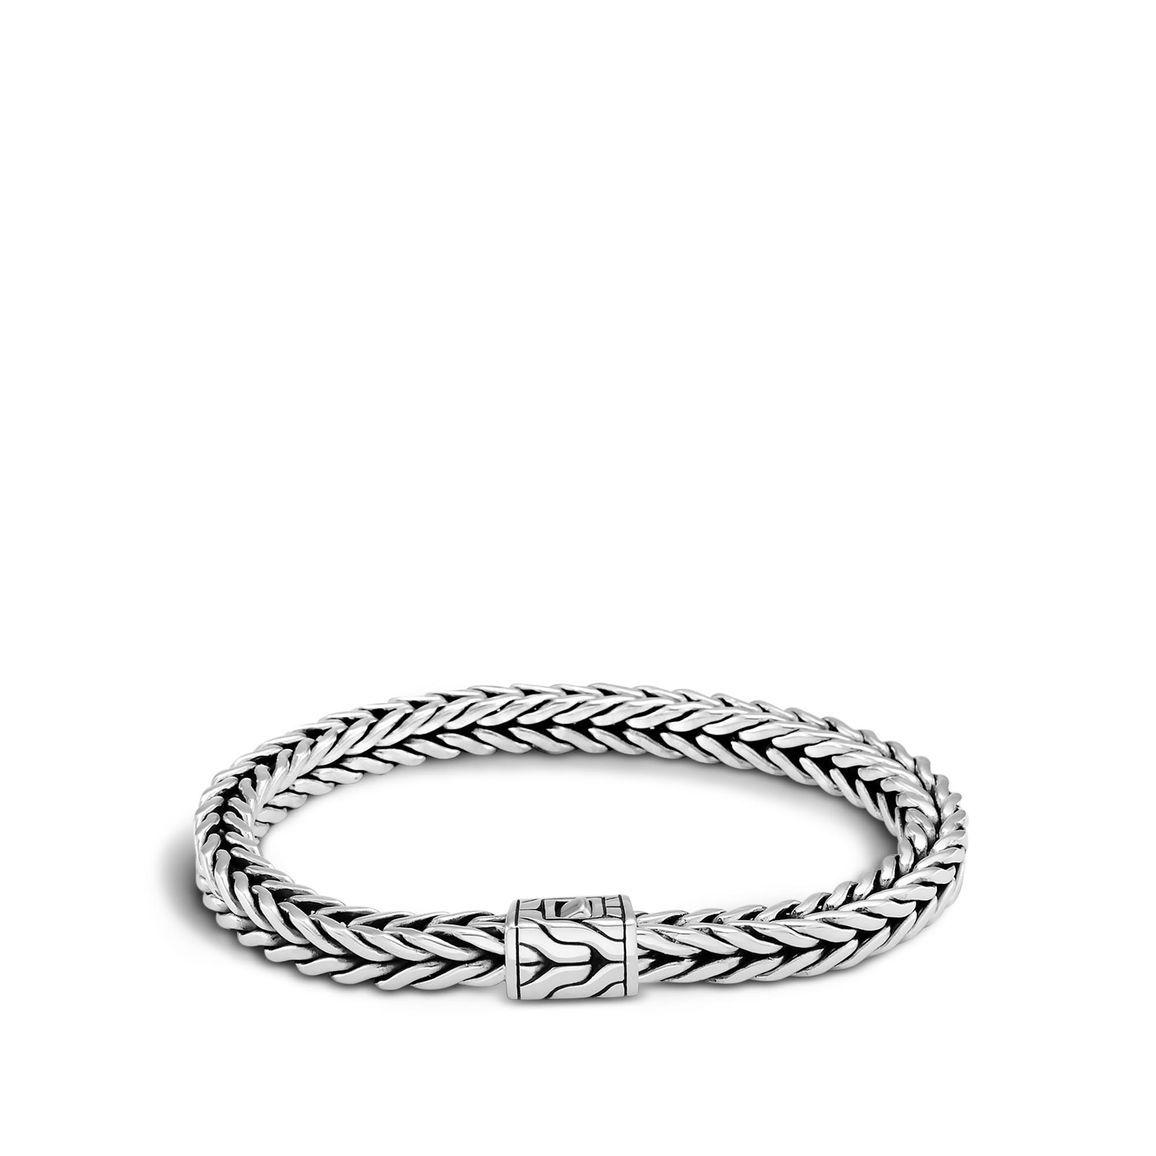 Classic chain small square bracelet armbänder pinterest chains